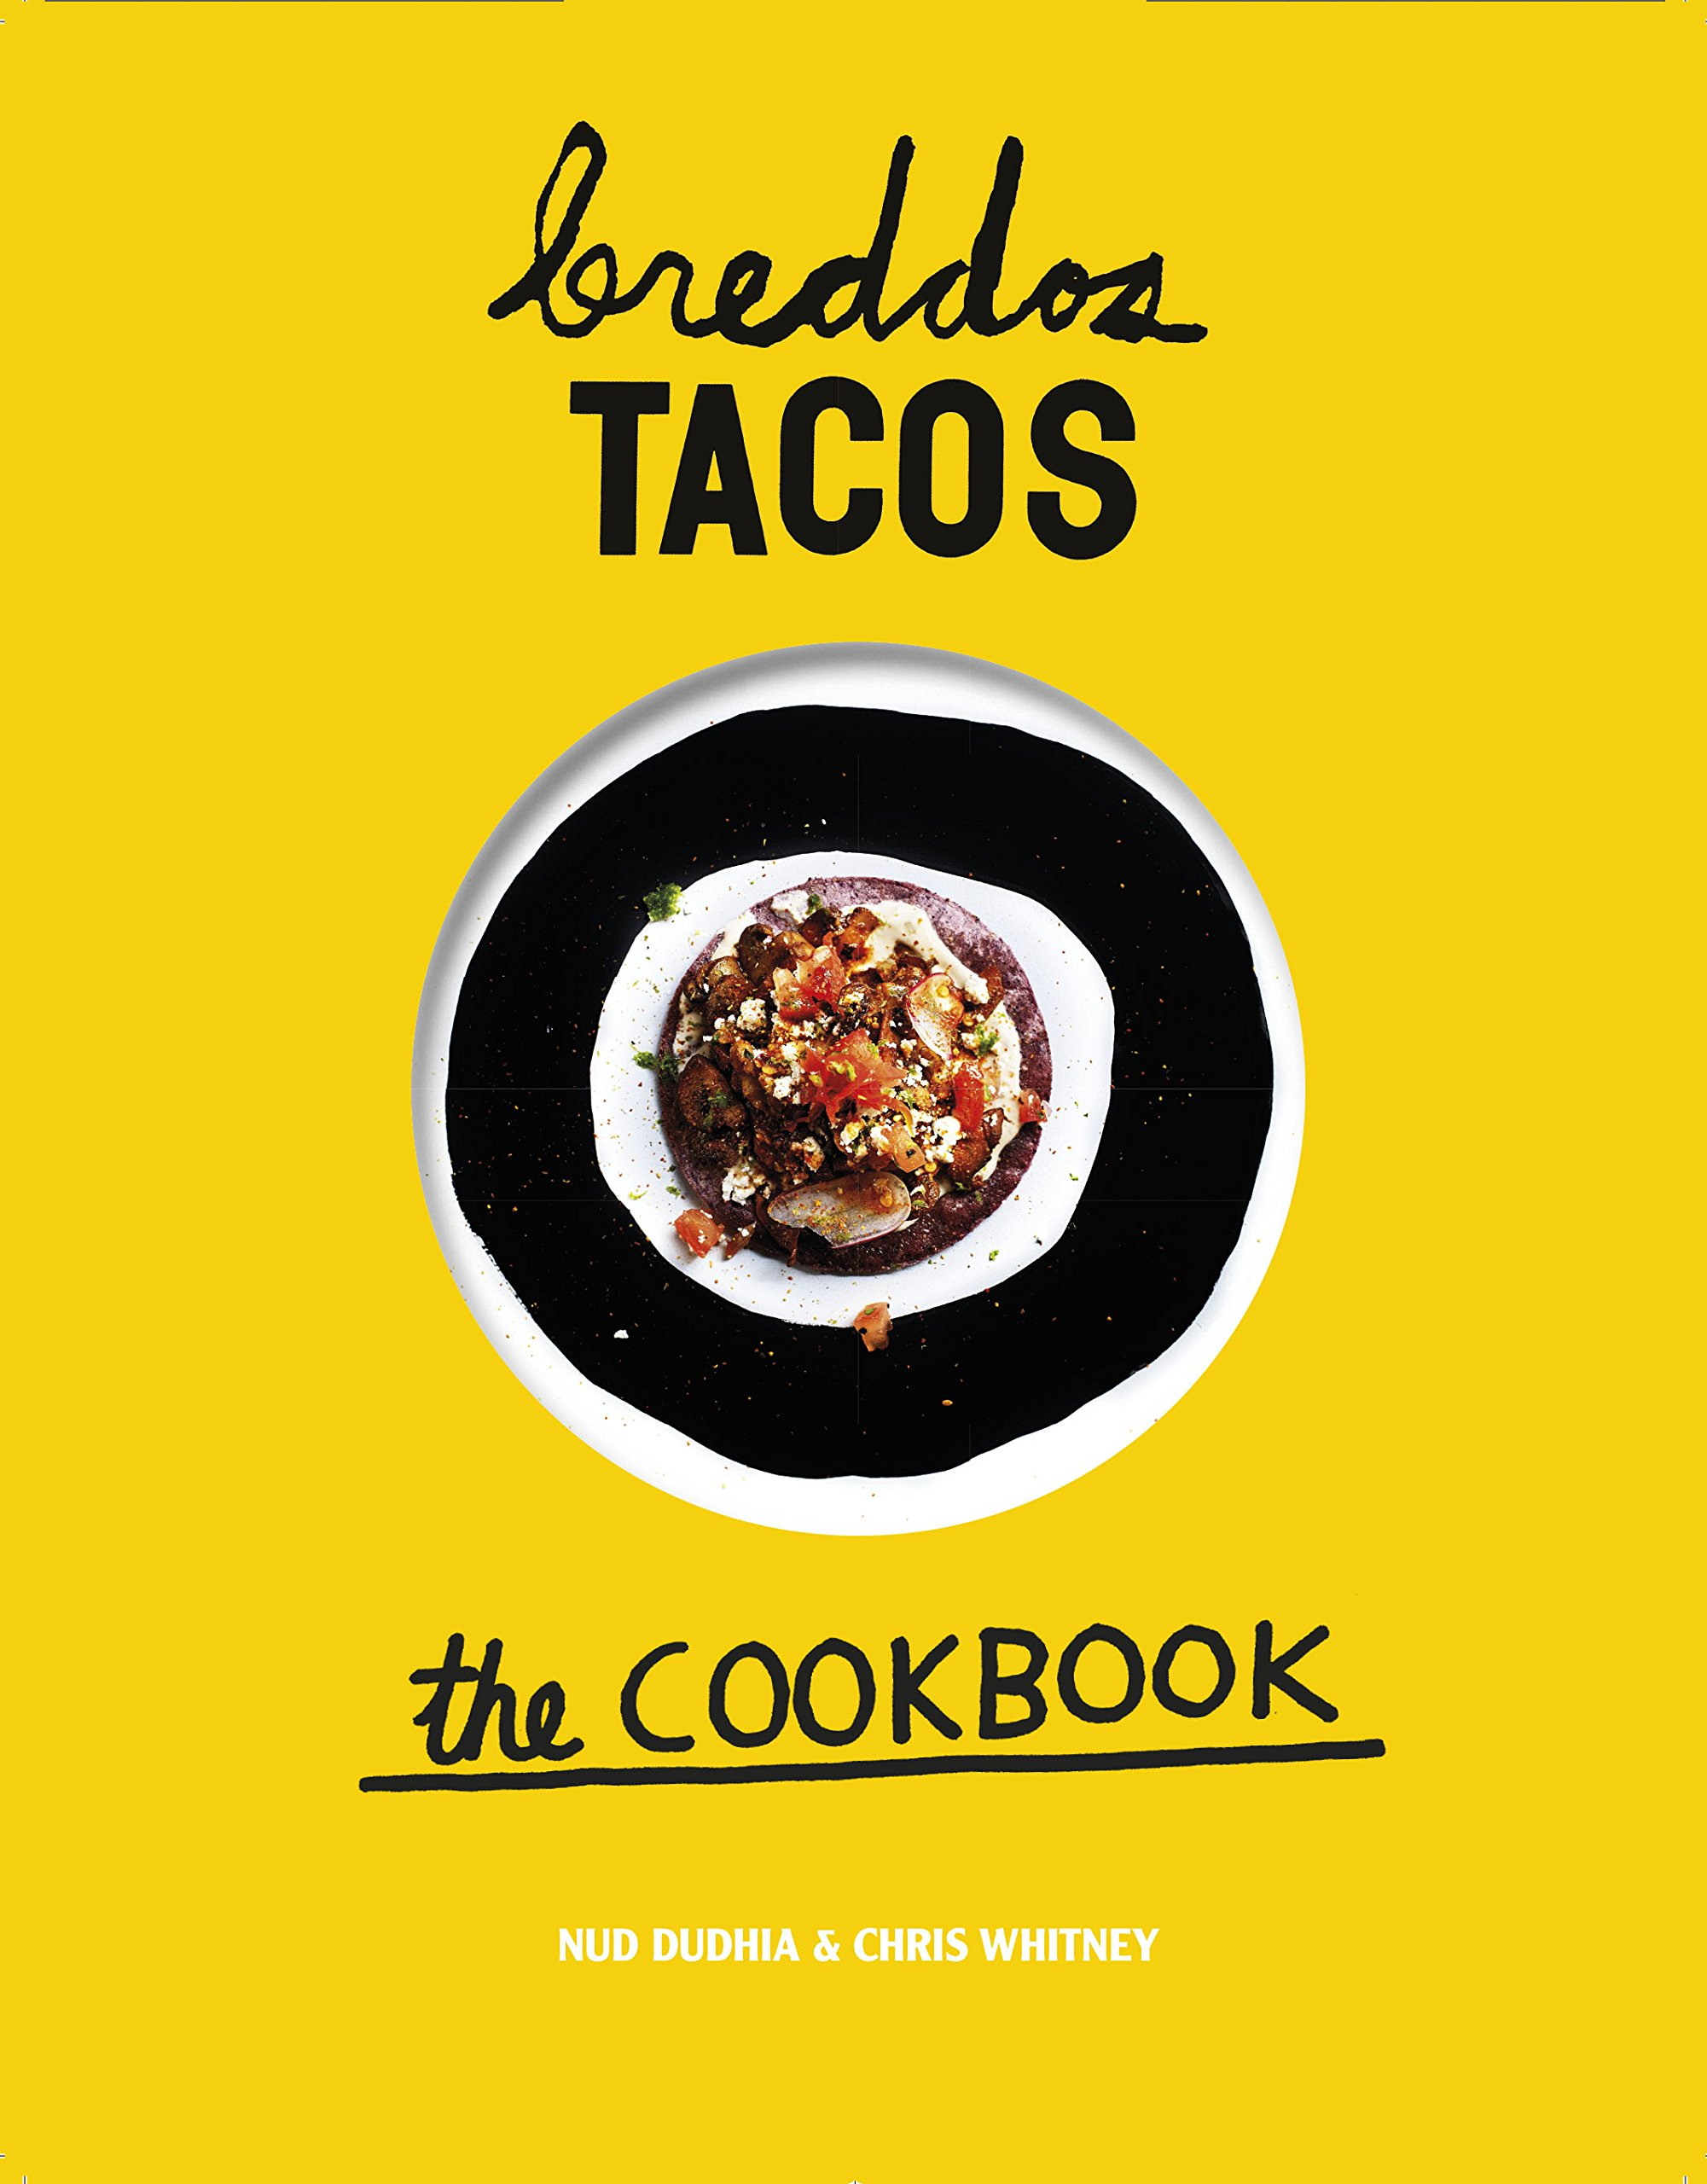 breddos Tacos: the cookbook: Amazon.co.uk: Nud Dudhia, Chris ...